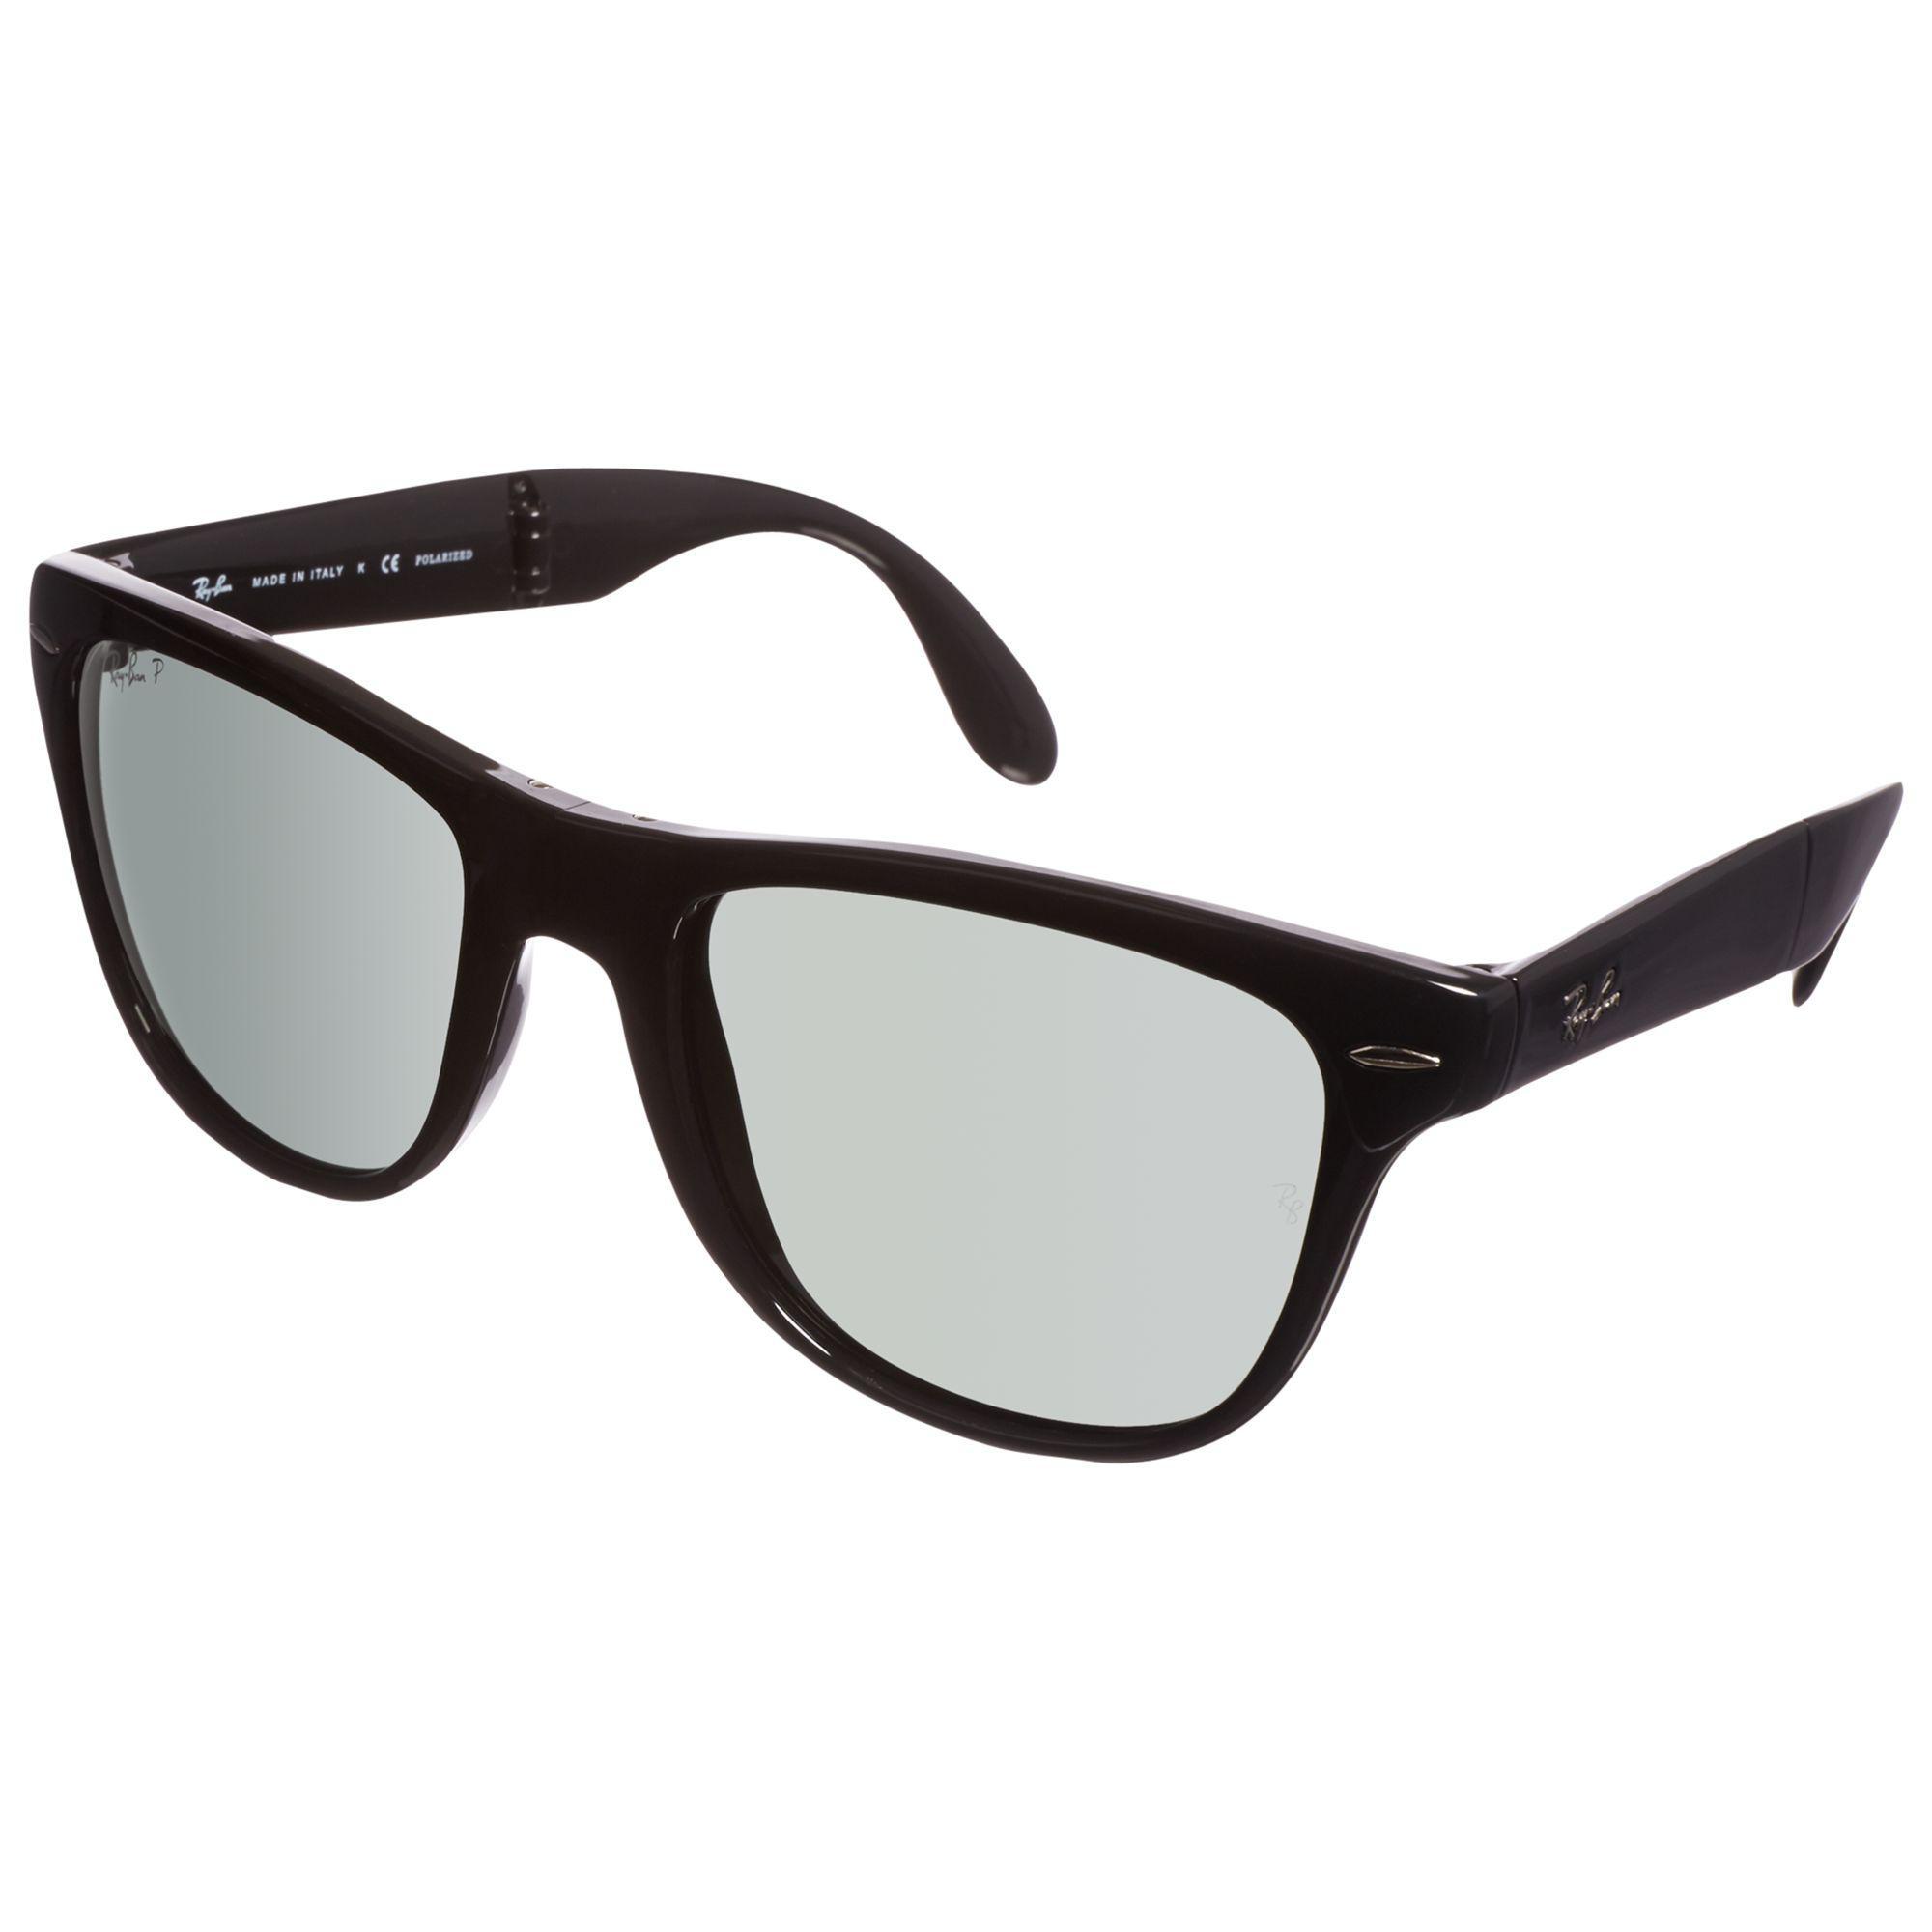 6fb4de444e Ray-Ban Rb4105 Polarised Folding Wayfarer Sunglasses in Black - Lyst